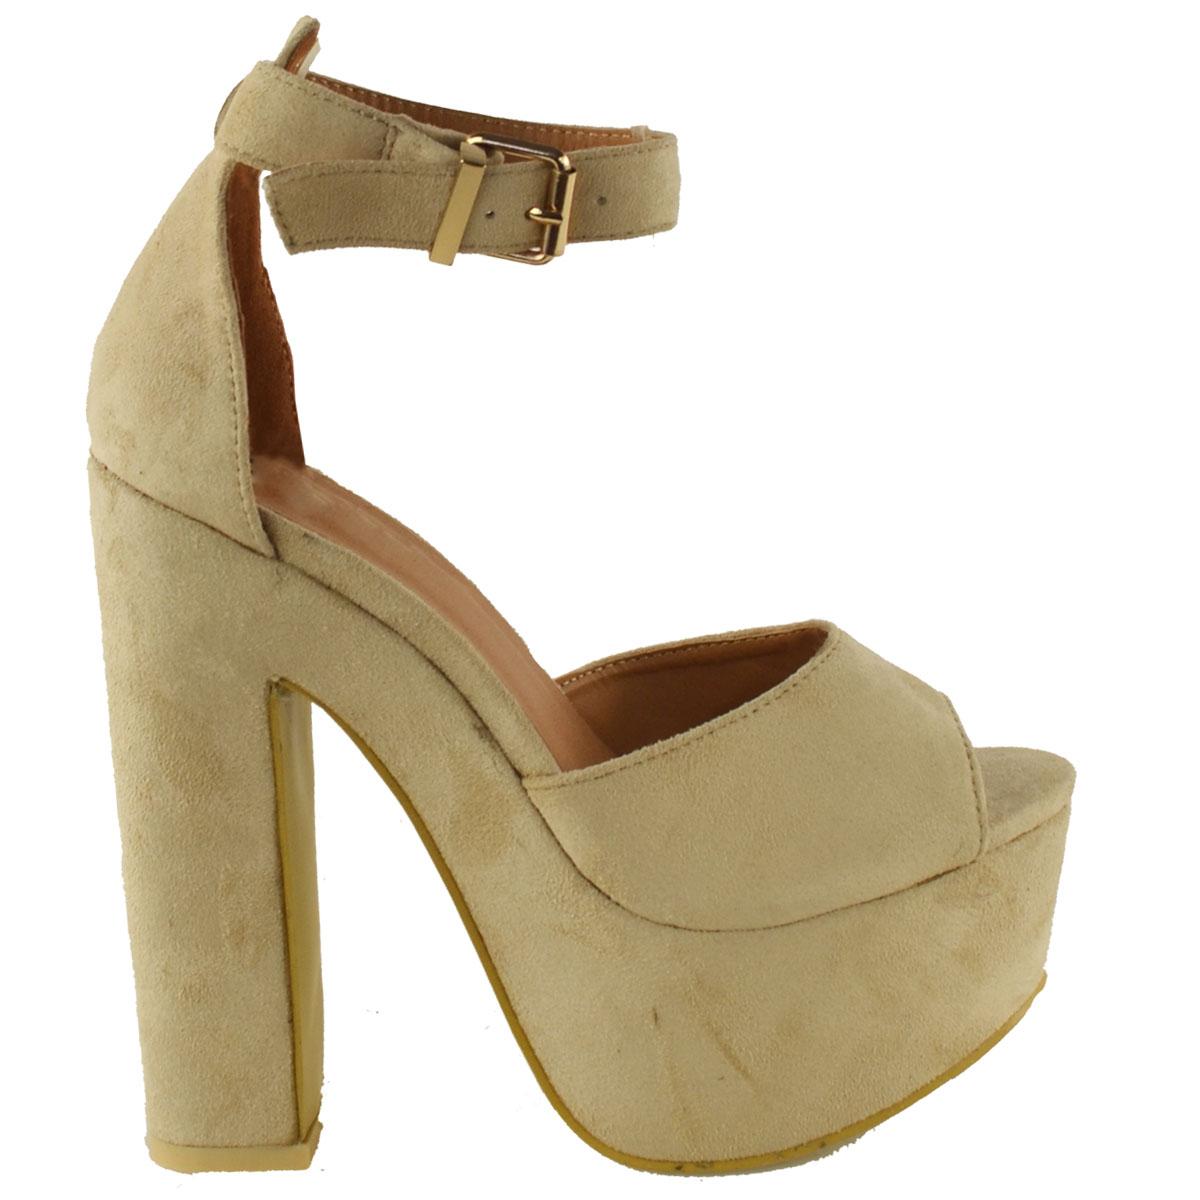 new womens ankle platform chunky high heel